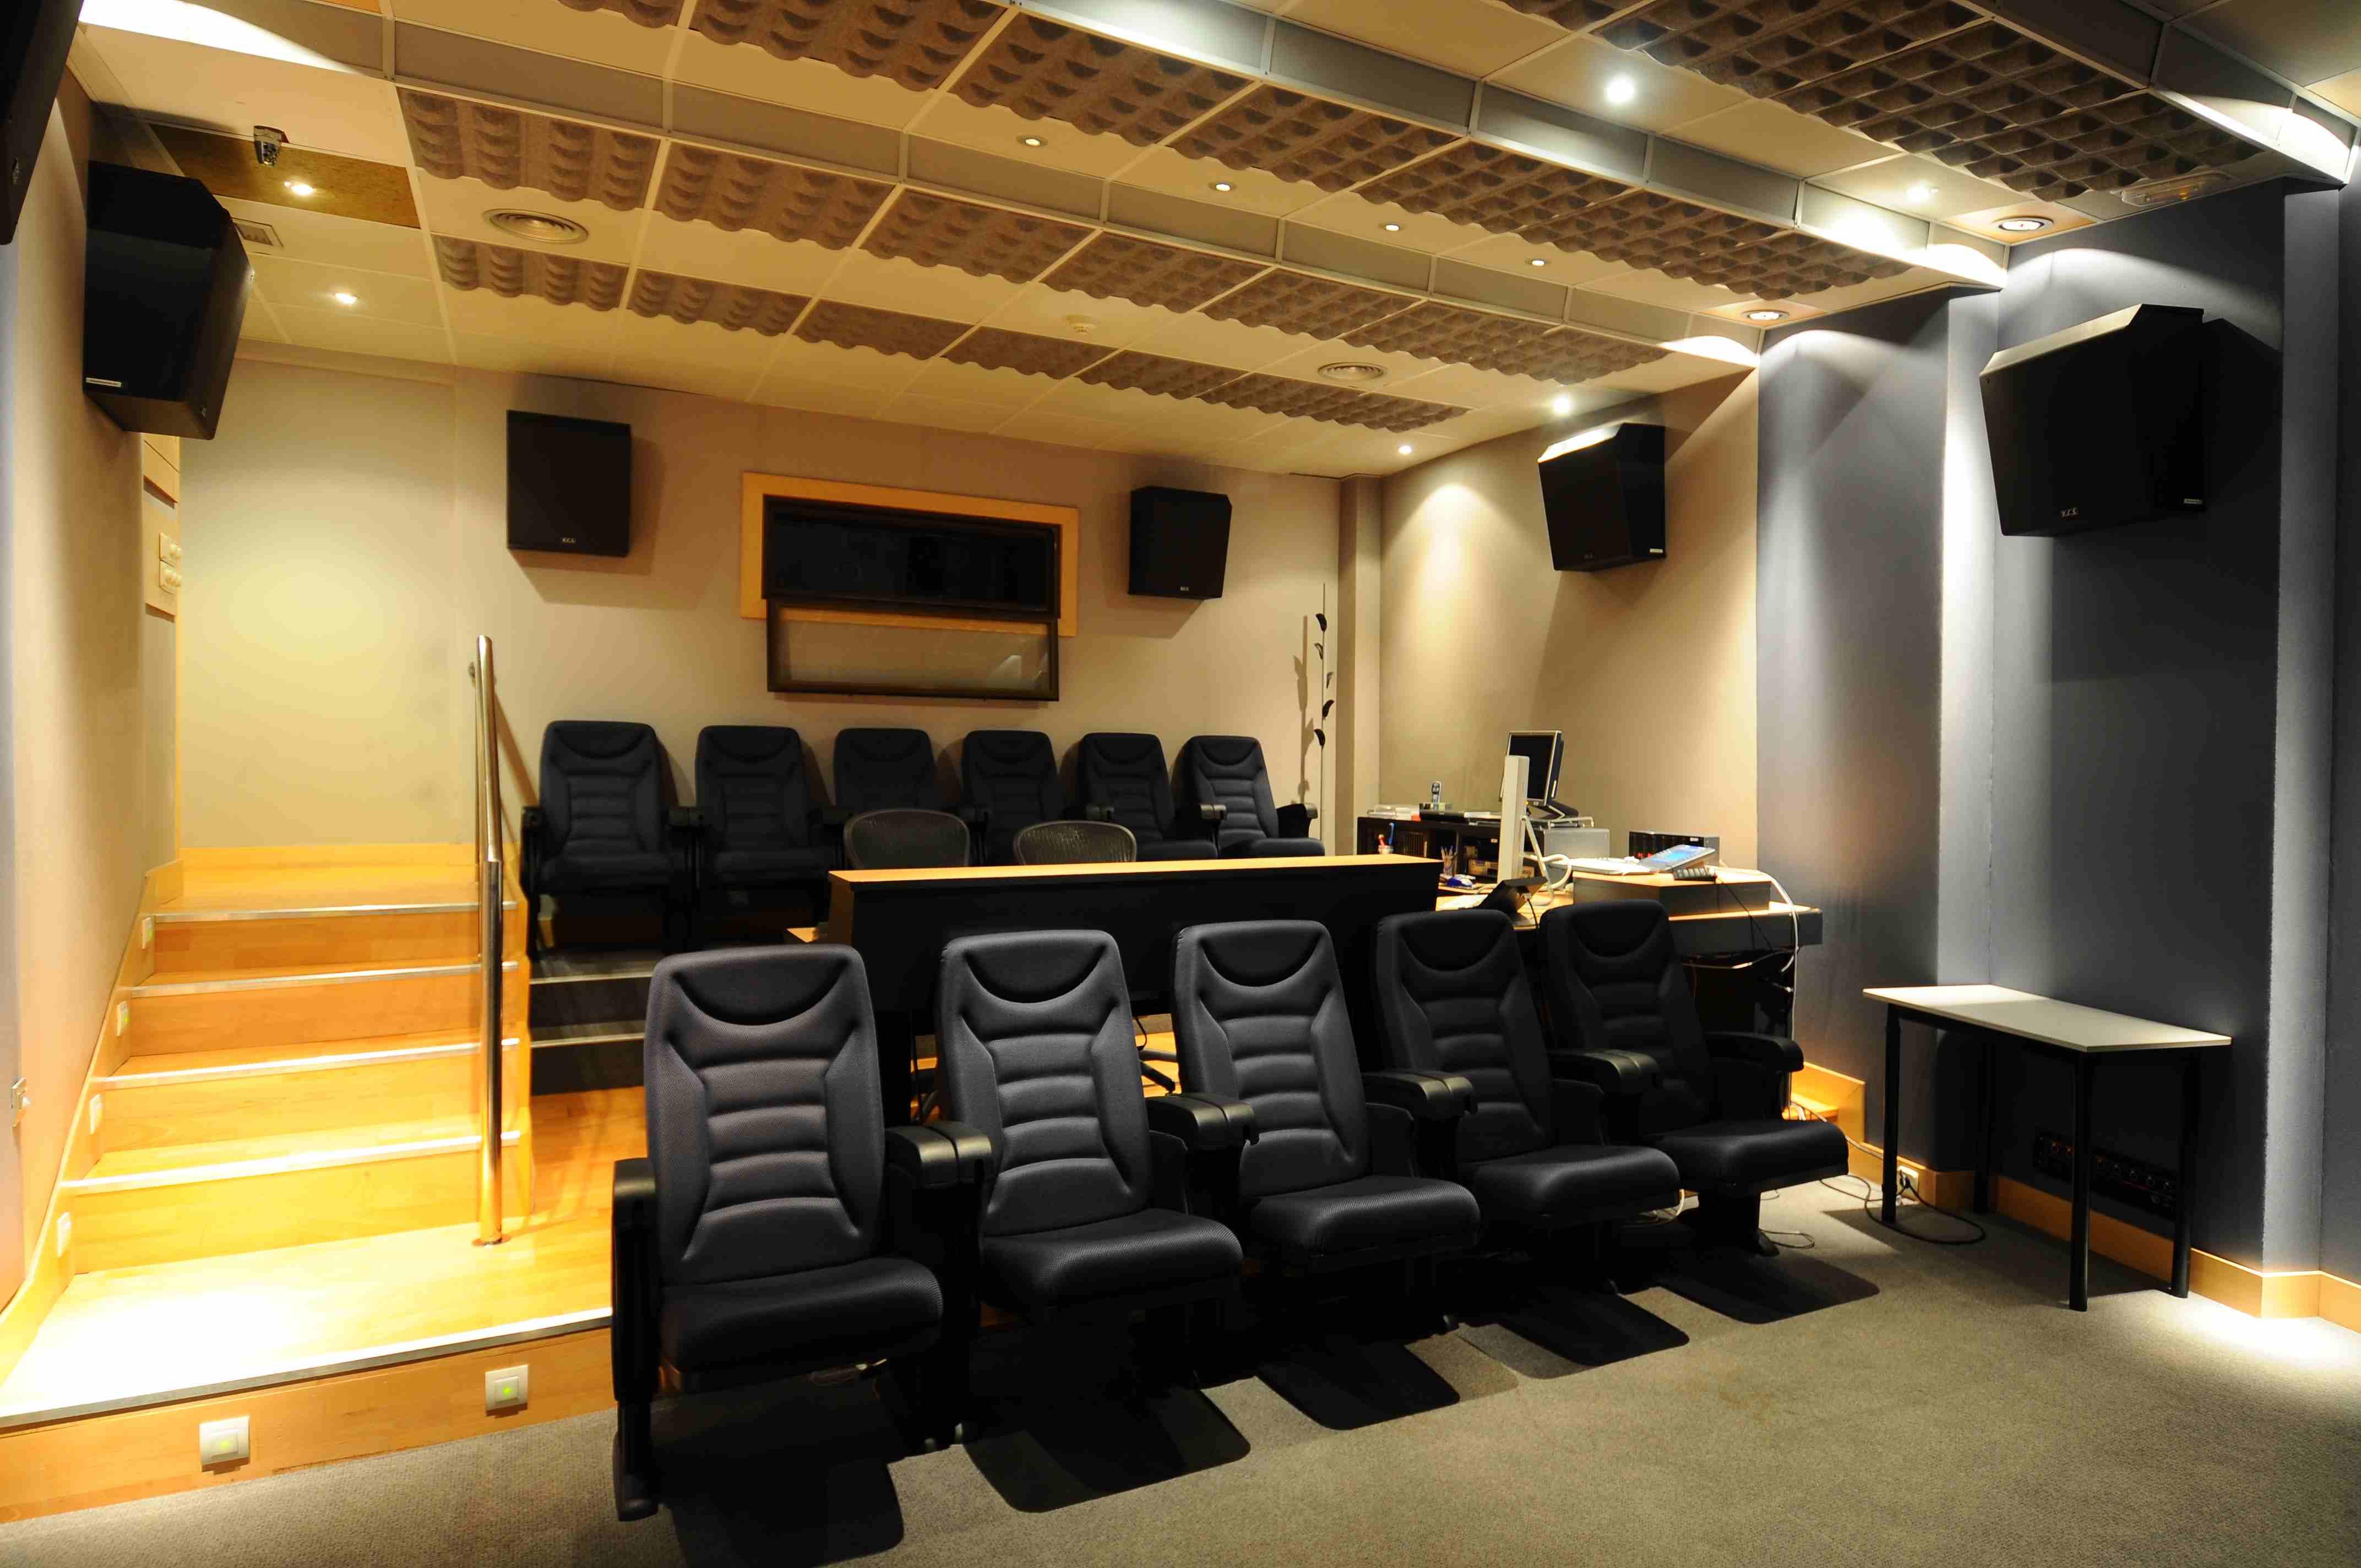 029 Sala Audio Cine.JPG